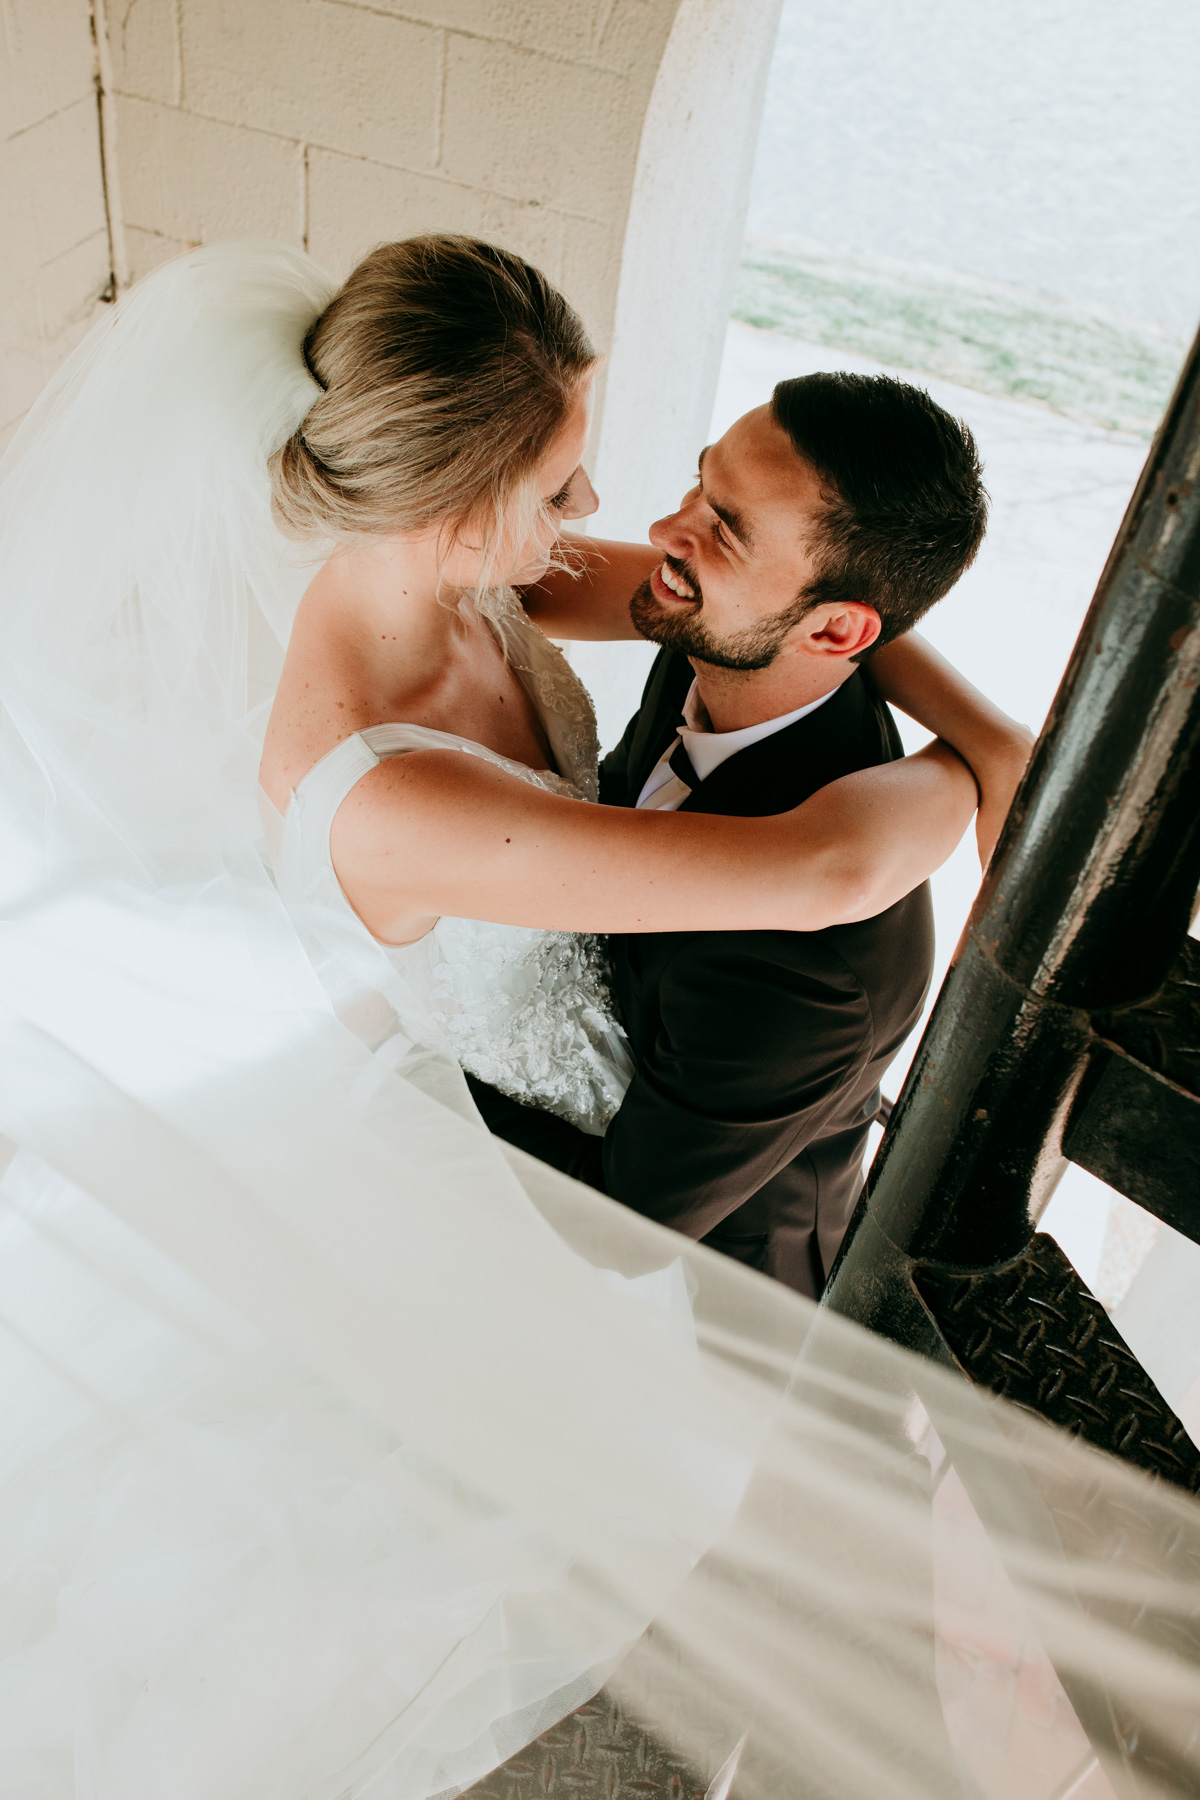 unique-wedding-photo-ideas.jpg